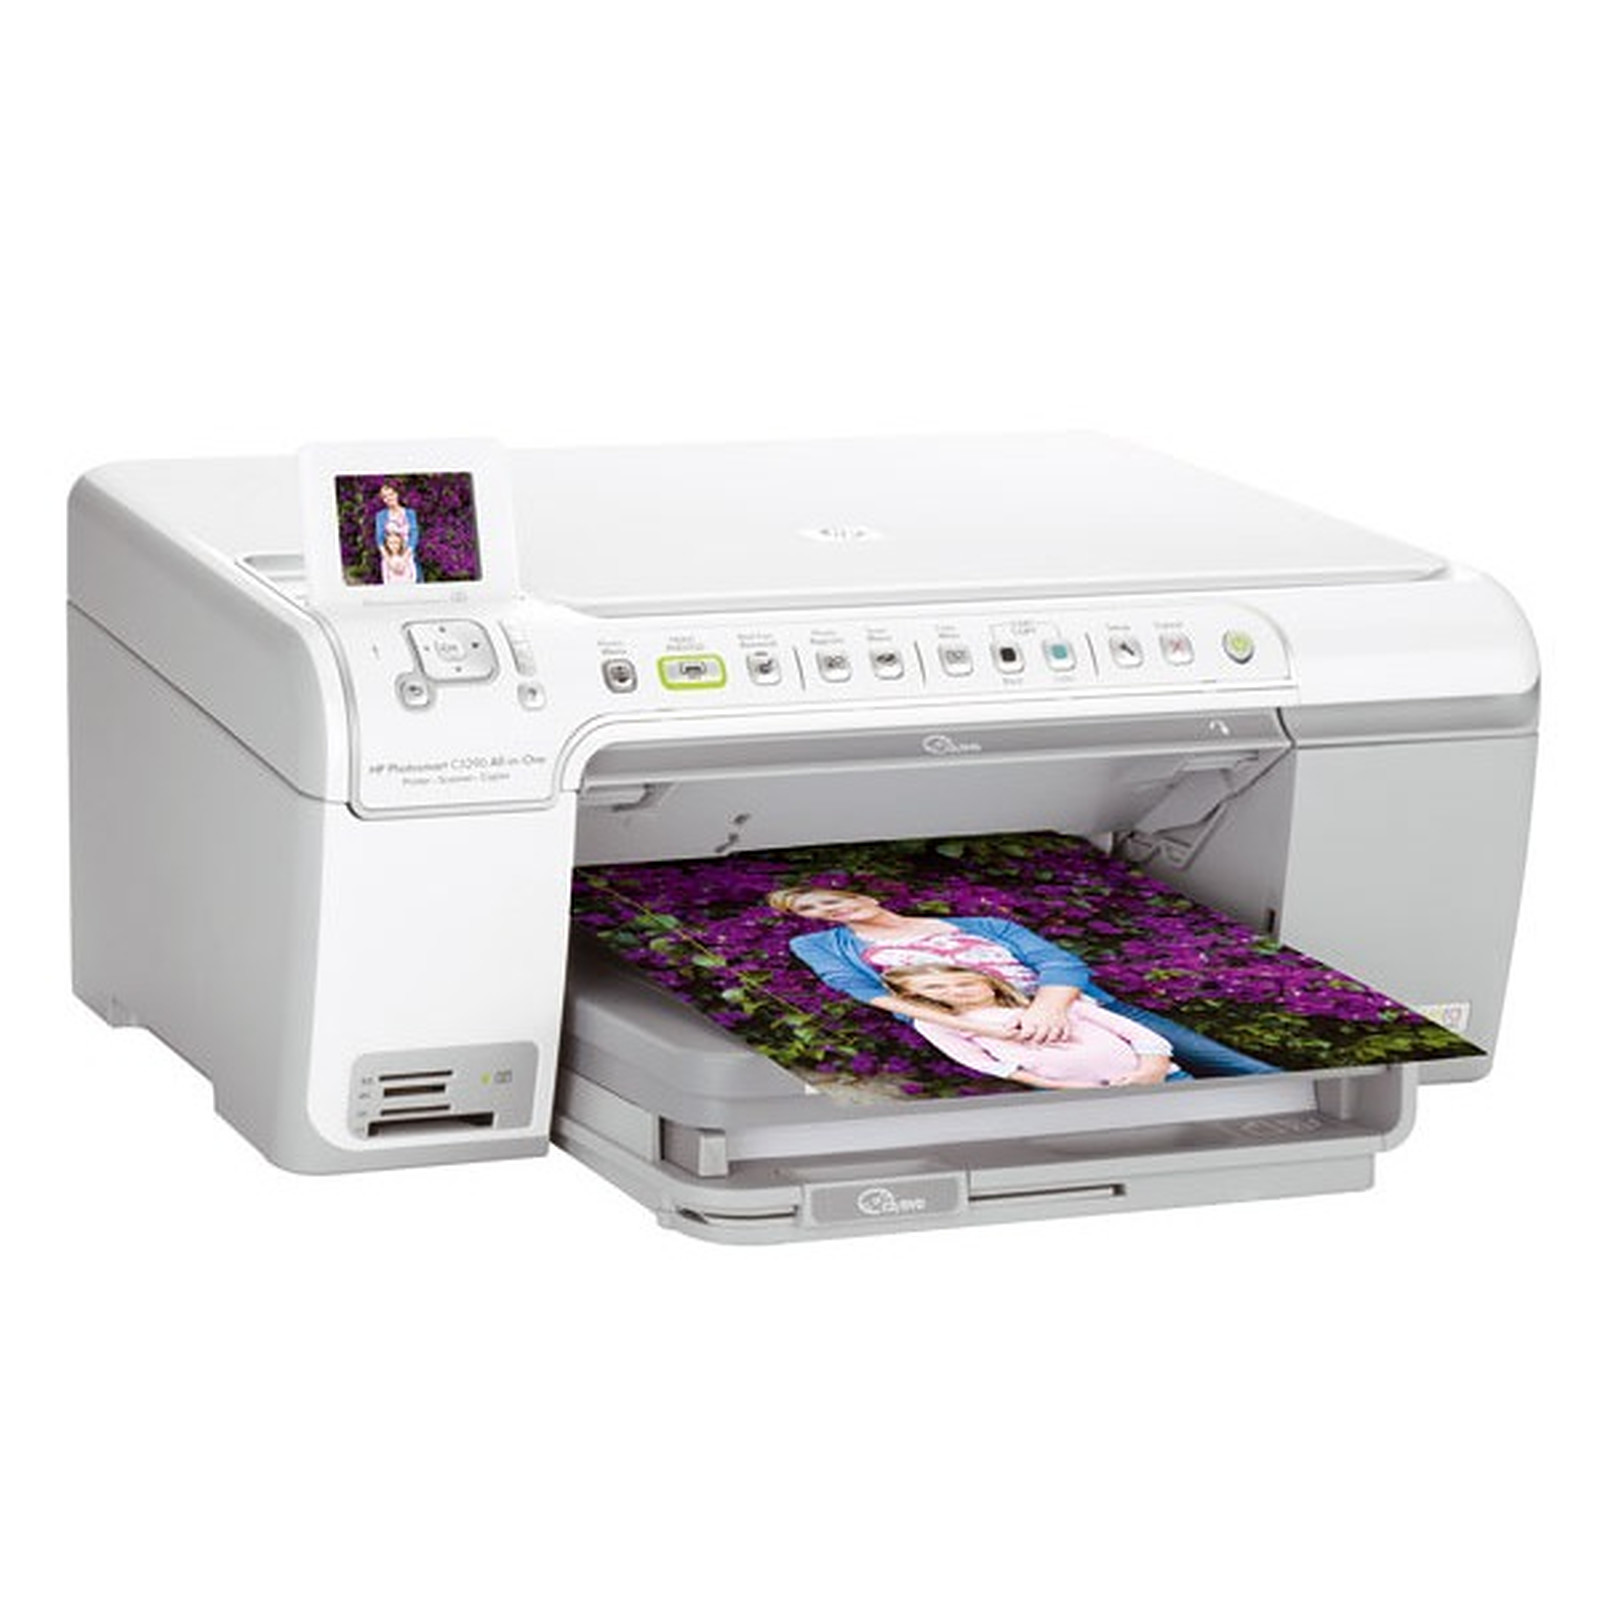 logiciel imprimante hp photosmart c5280